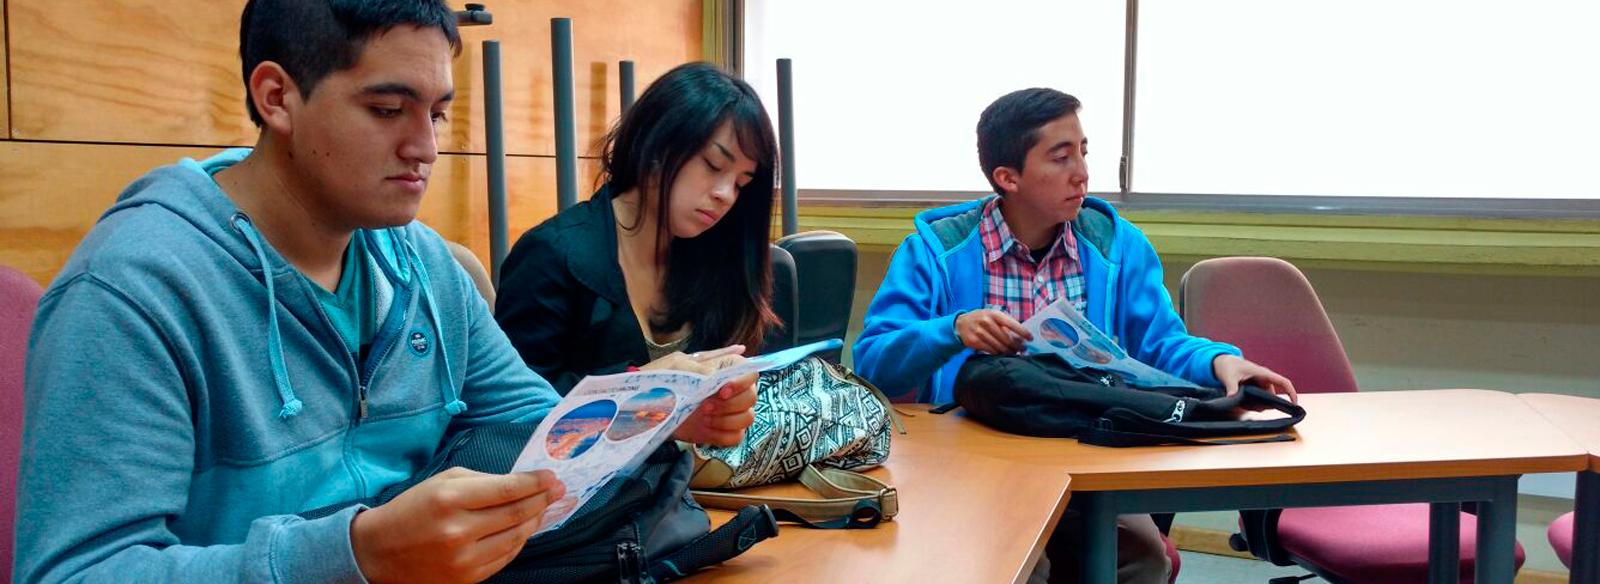 Facing-Upla beca a 10 alumnos para estadía corta en Antofagasta